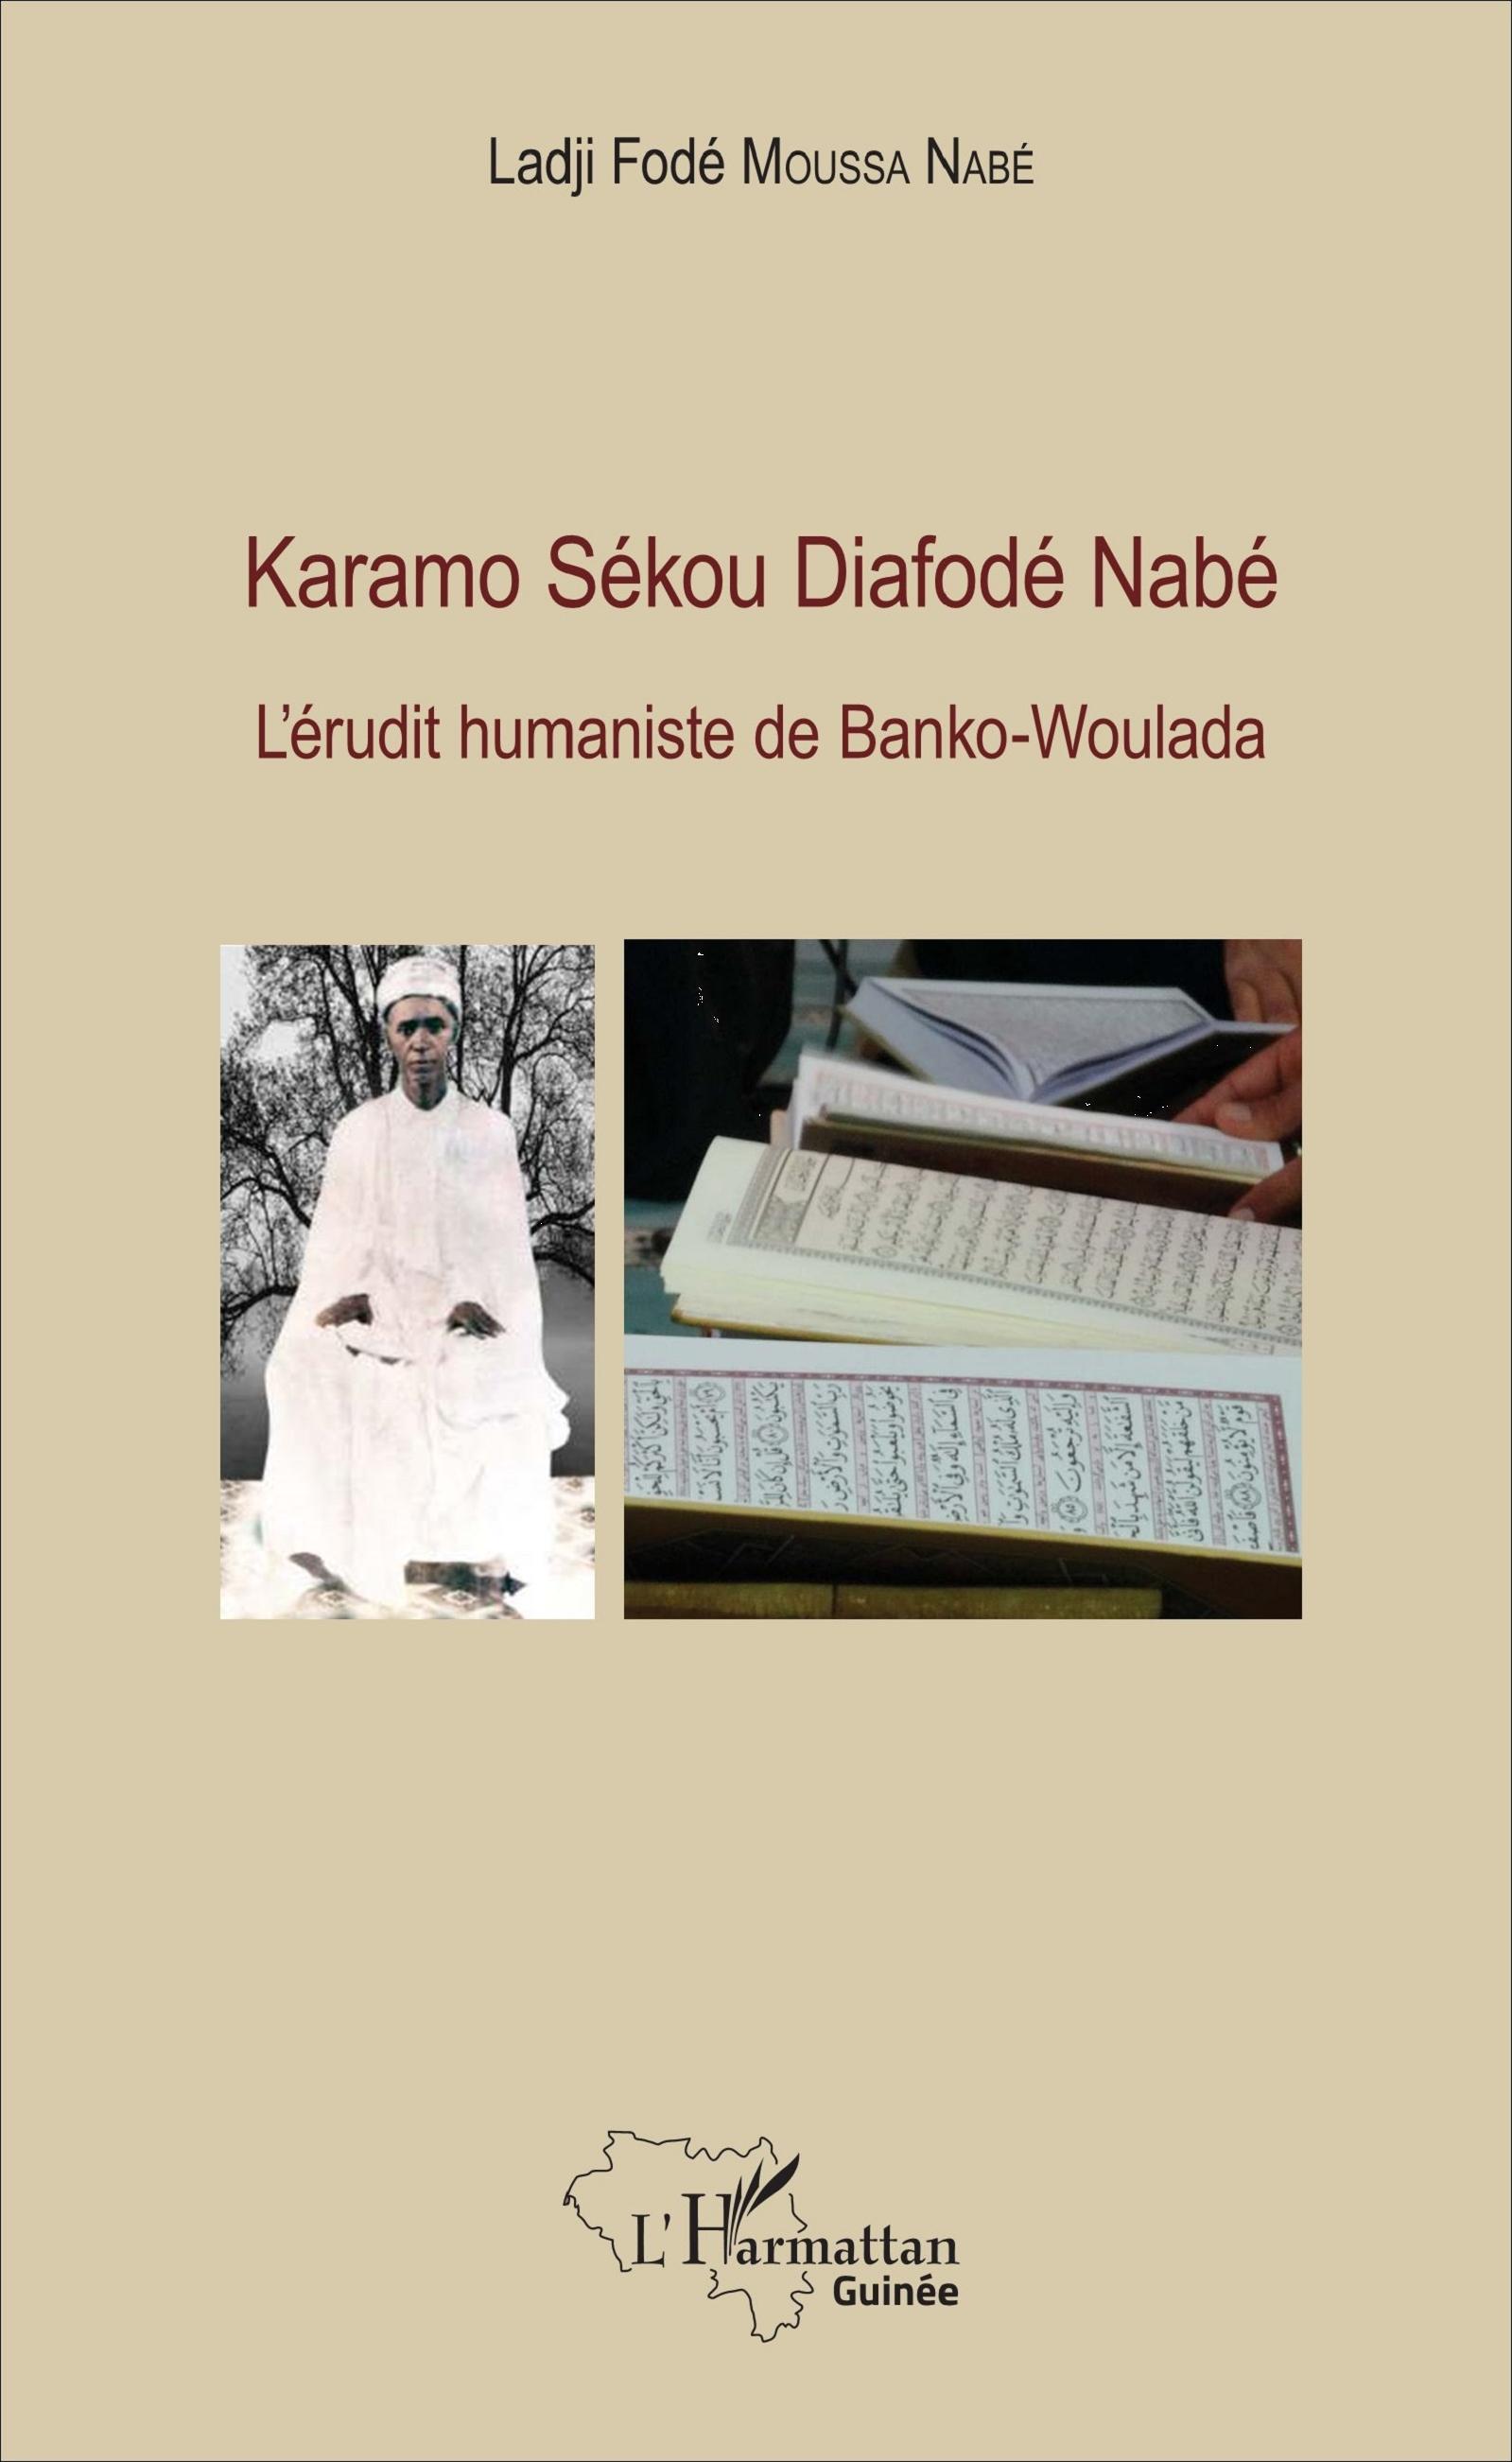 KARAMO SEKOU DIAFODE NABE - L'ERUDIT HUMANISTE DE BANKO-WOULADA